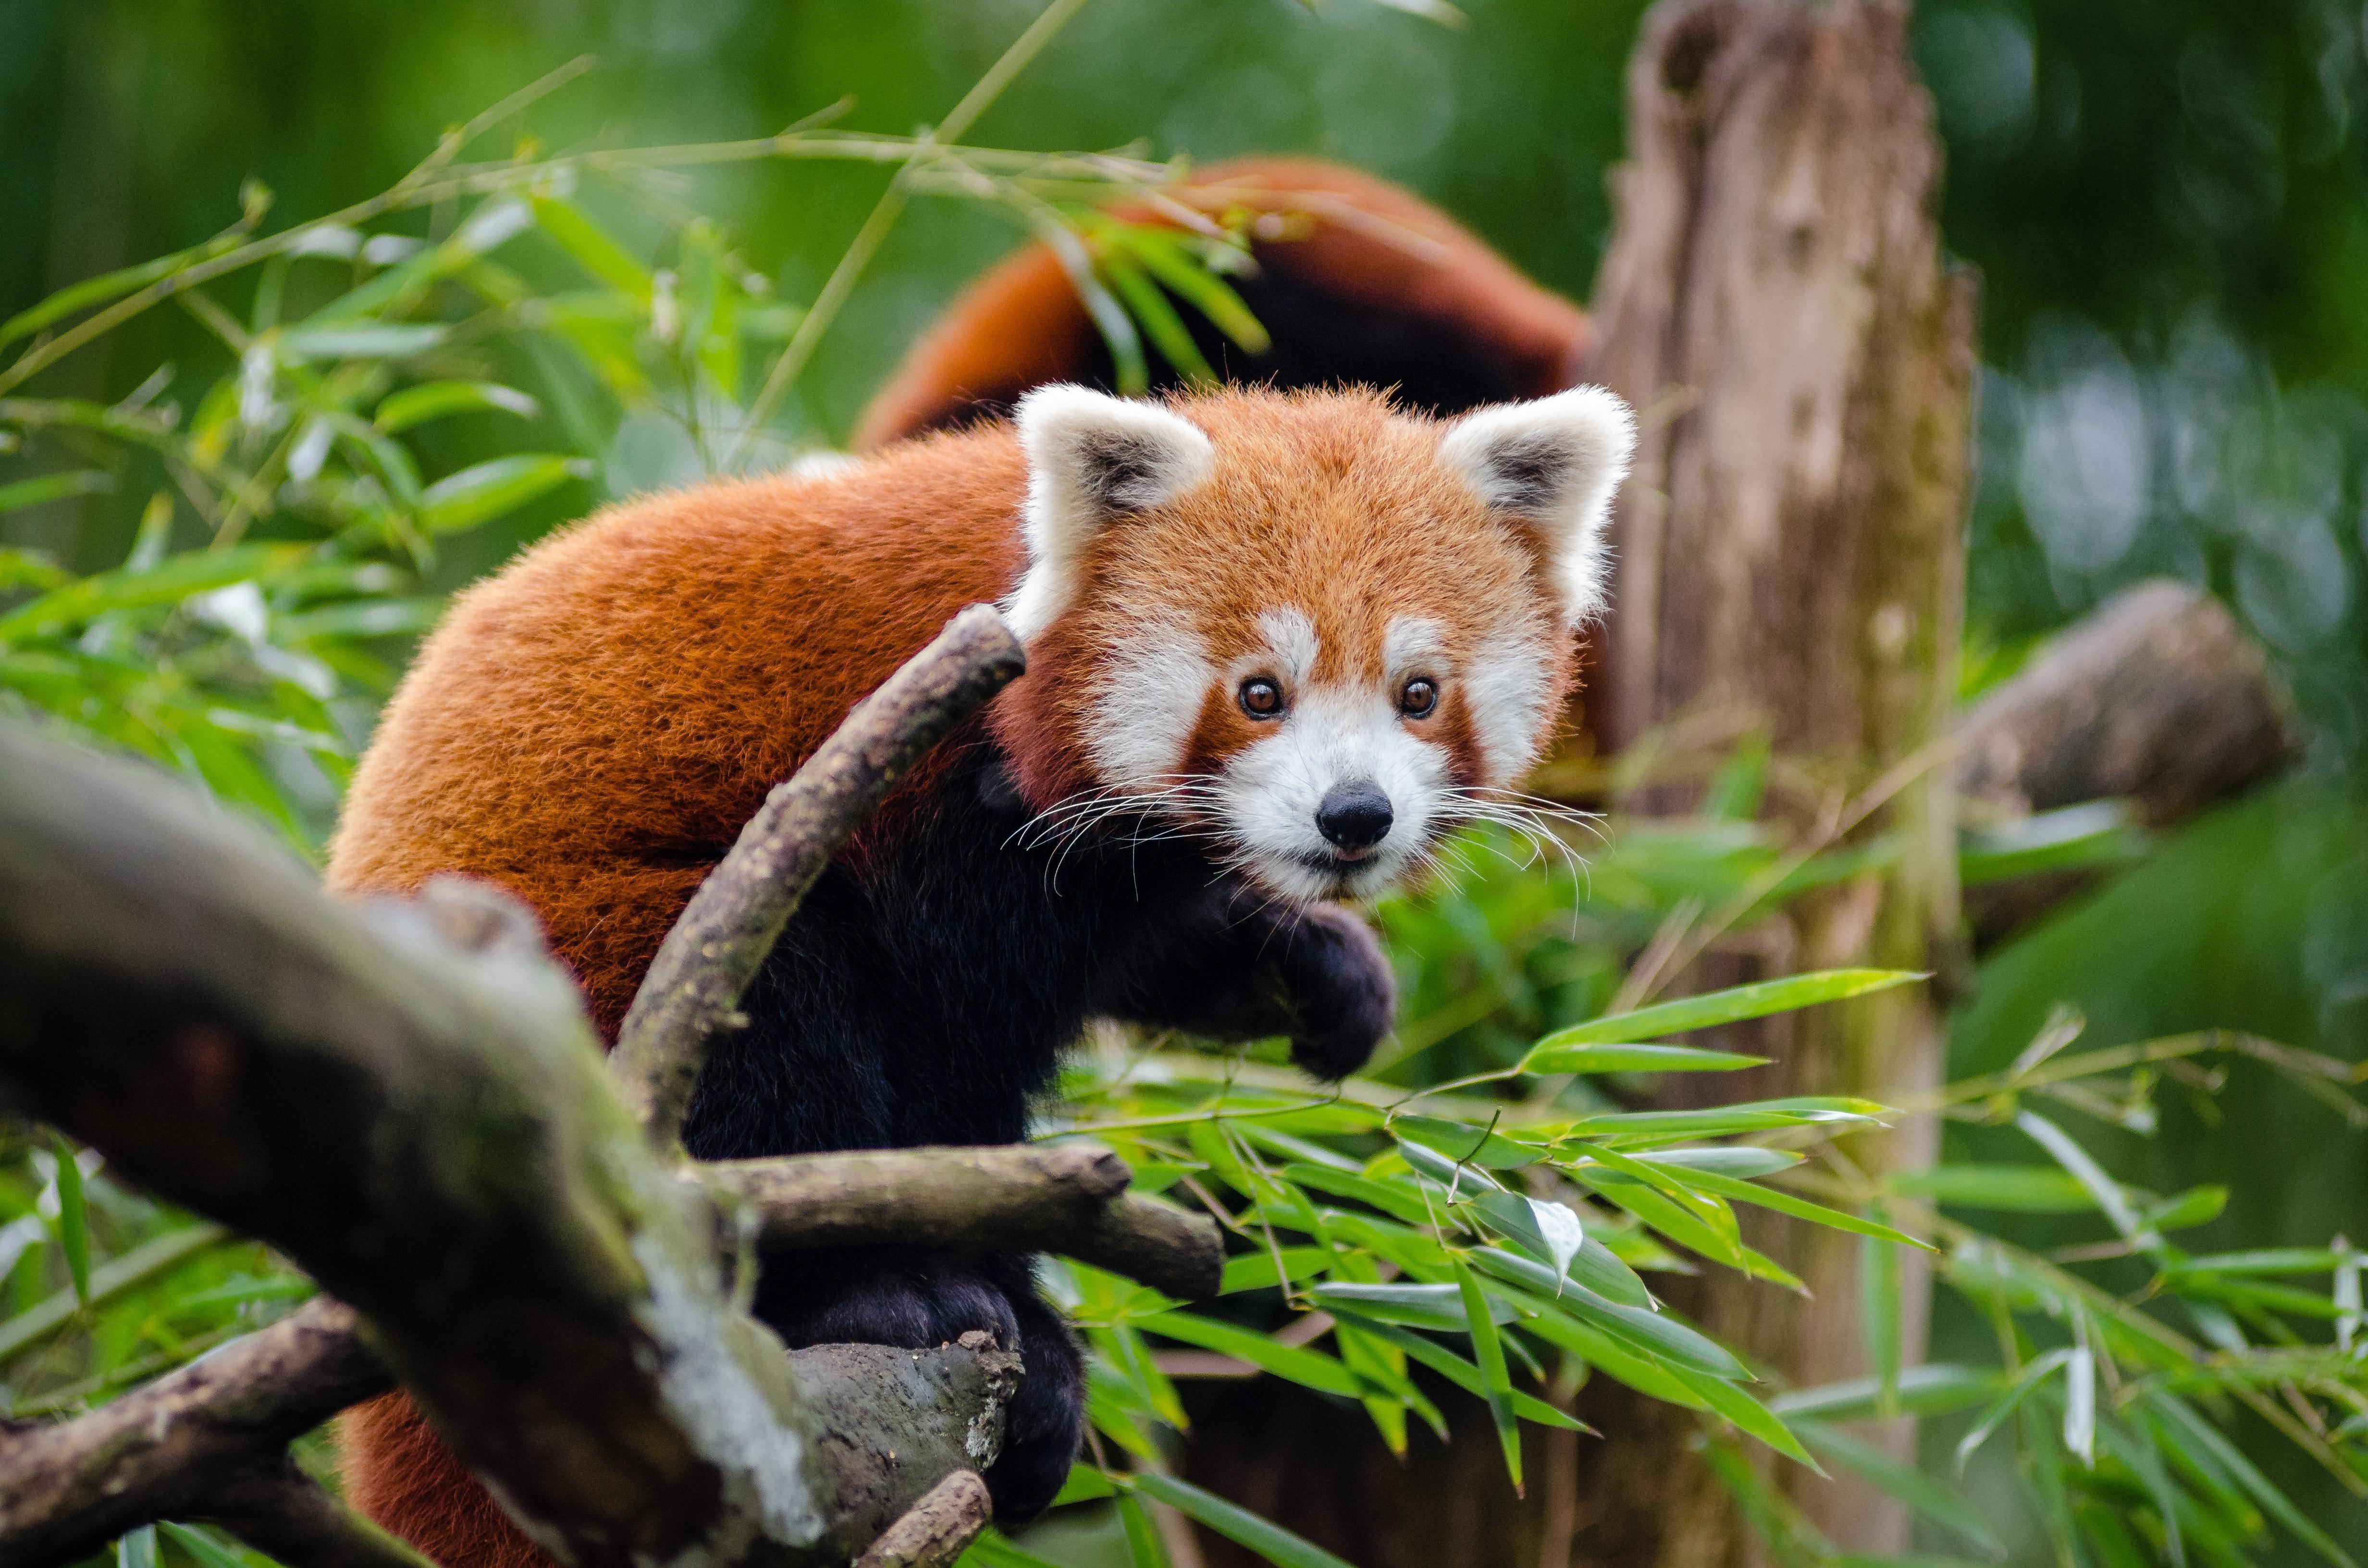 Orange black animal on tree branch photo